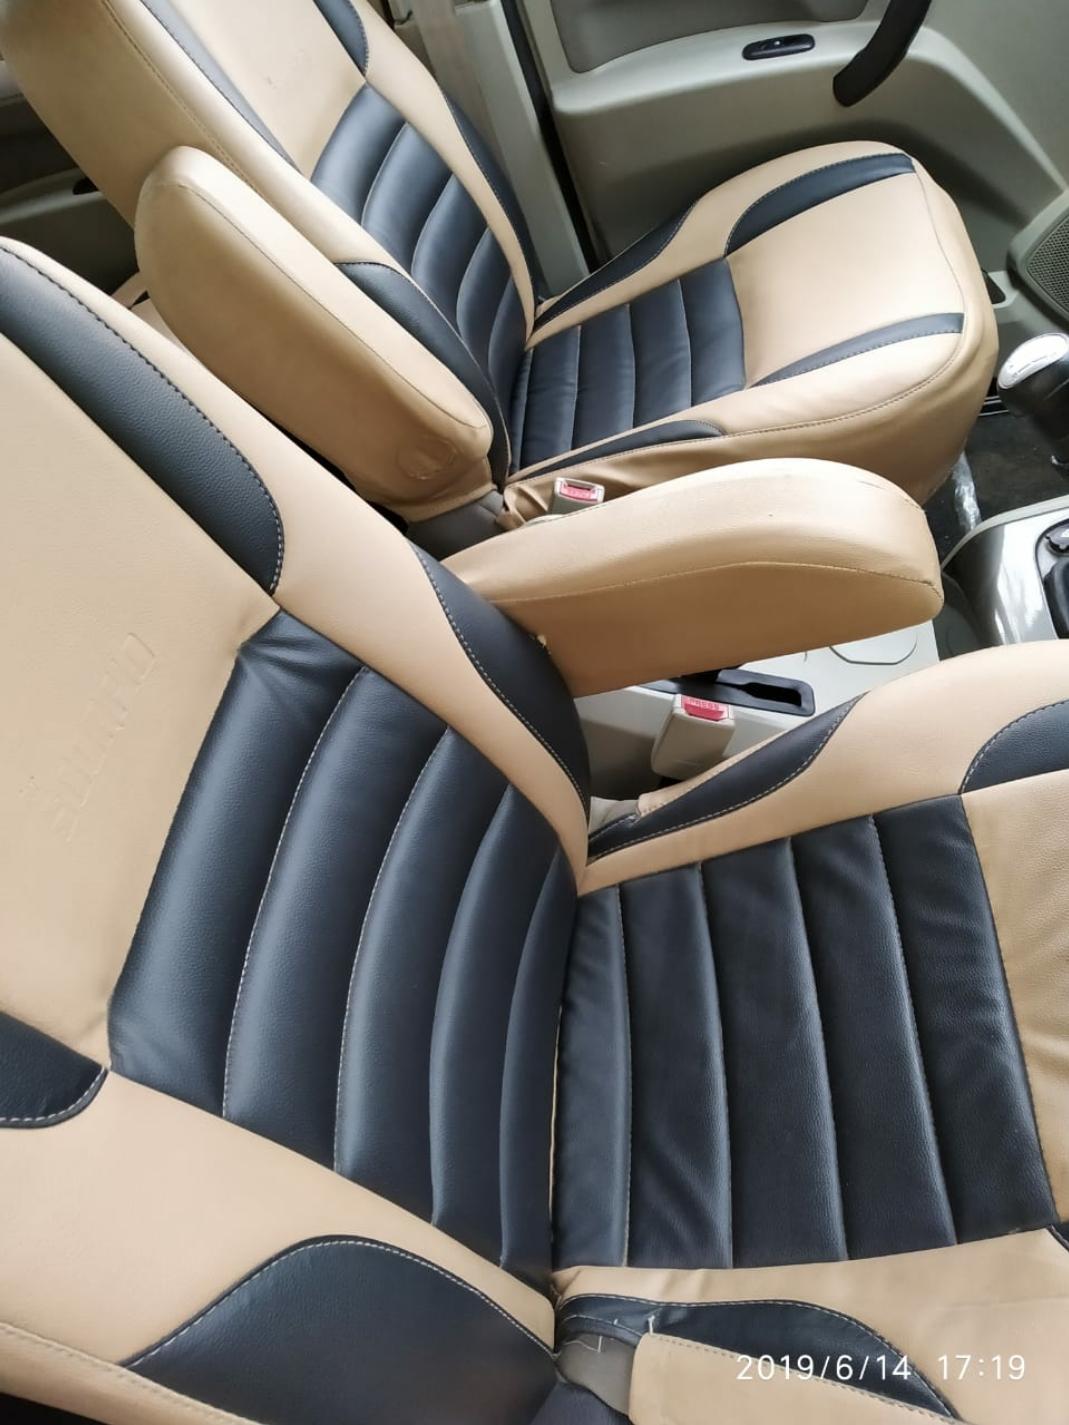 Sensational Mahindra Scorpio S10 2Wd Intelli Hybrid Mahindra First Choice Creativecarmelina Interior Chair Design Creativecarmelinacom